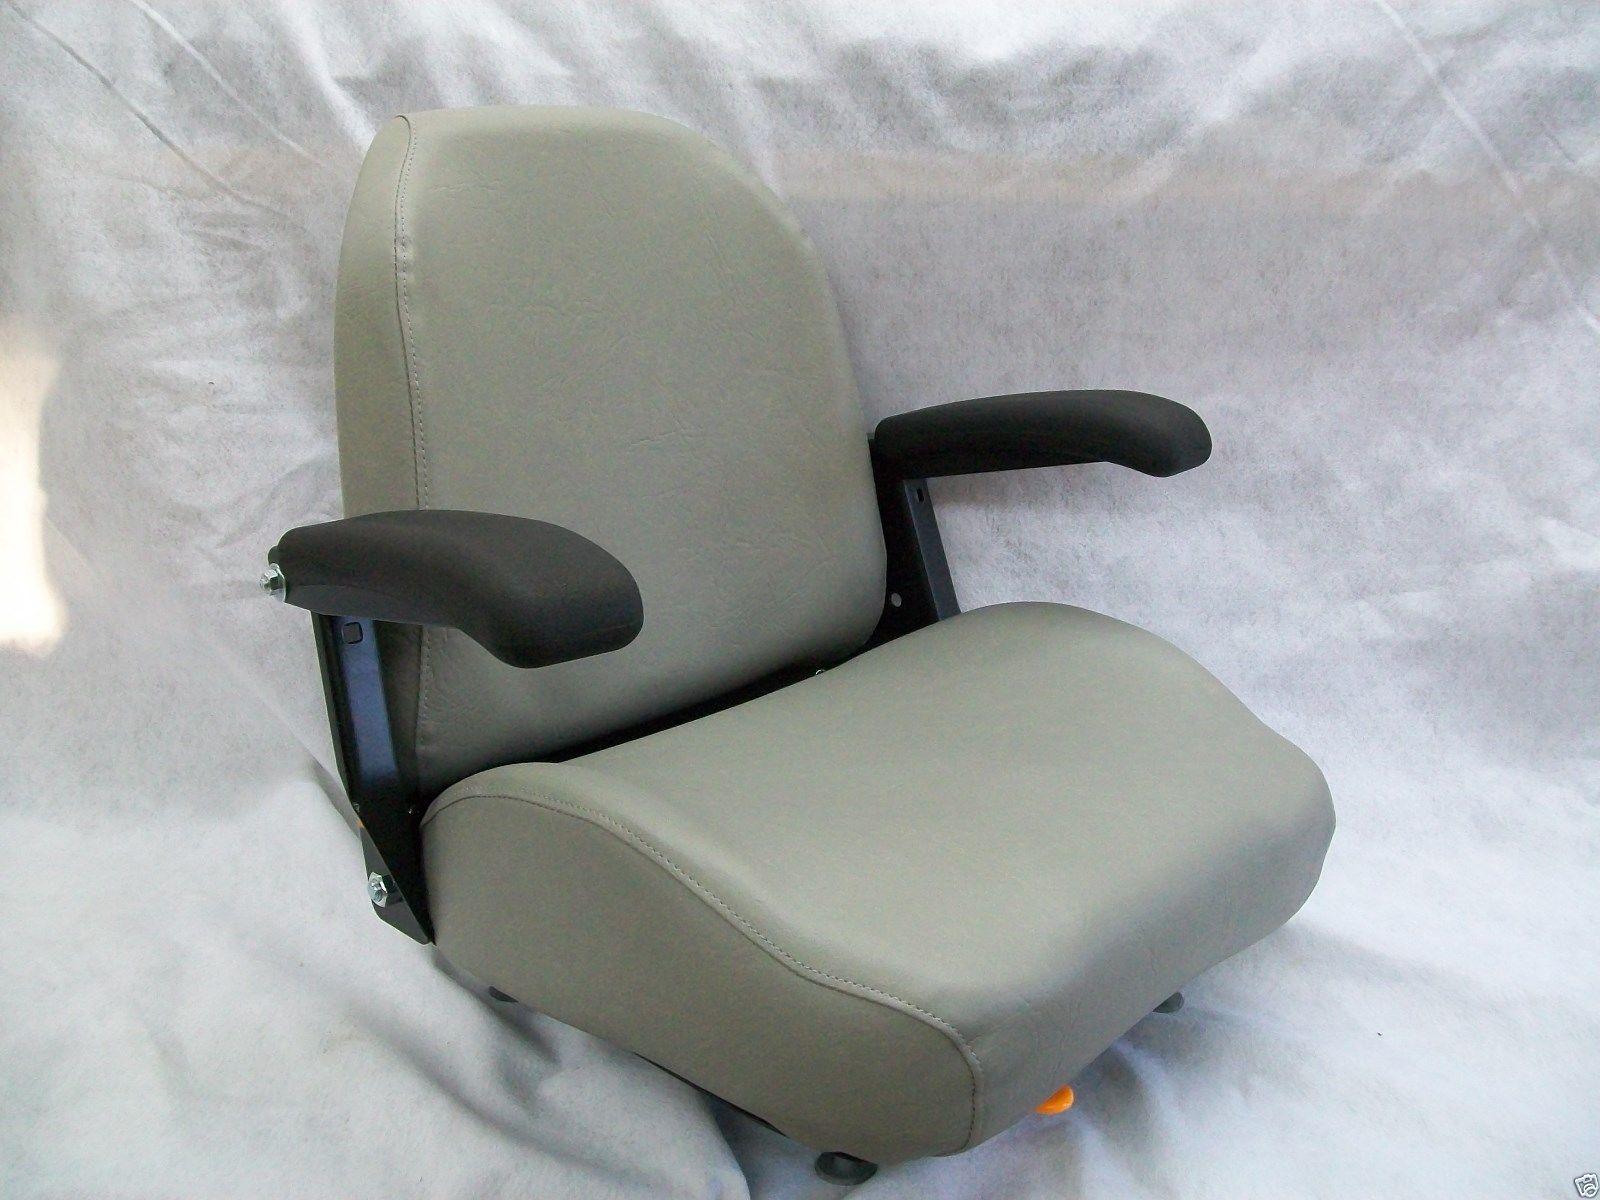 Snapper Mower Seat : Gray high back seat bunton bobcat dixie snapper toro